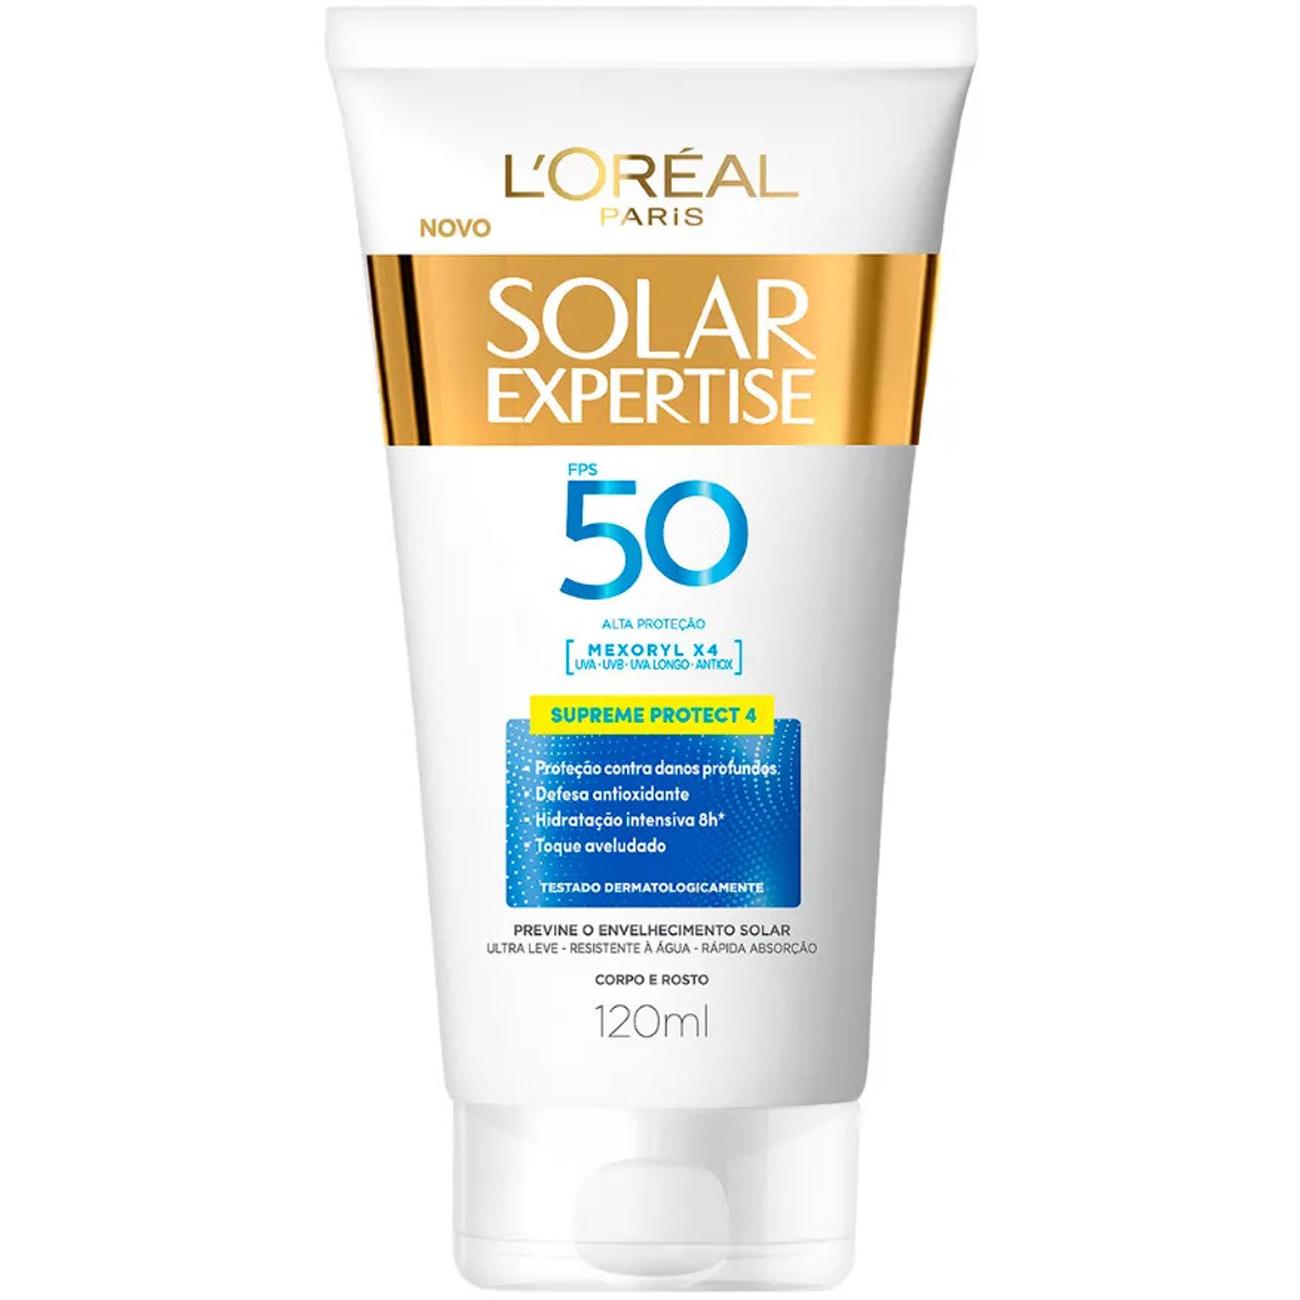 Protetor Solar LOreal Paris Solar Expertise Supreme Protect 4 FPS 50 120ml